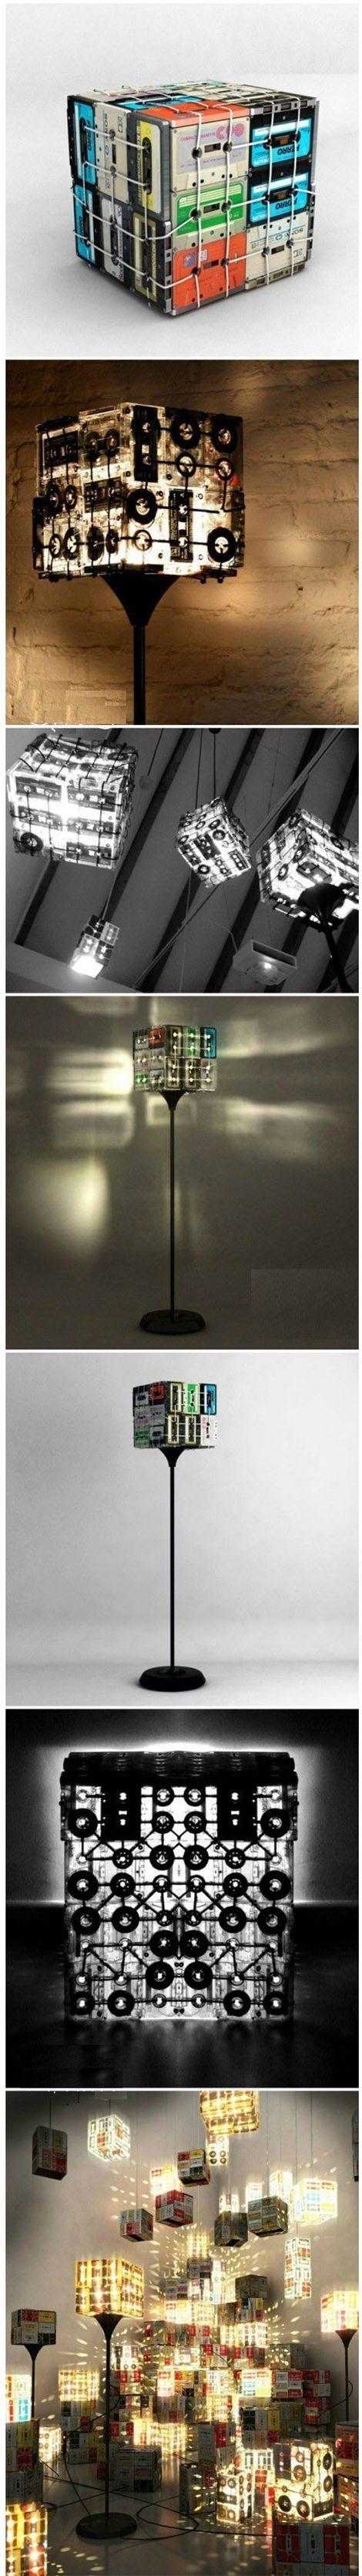 Great Tapes Lamp | DIY & Crafts Tutorials: